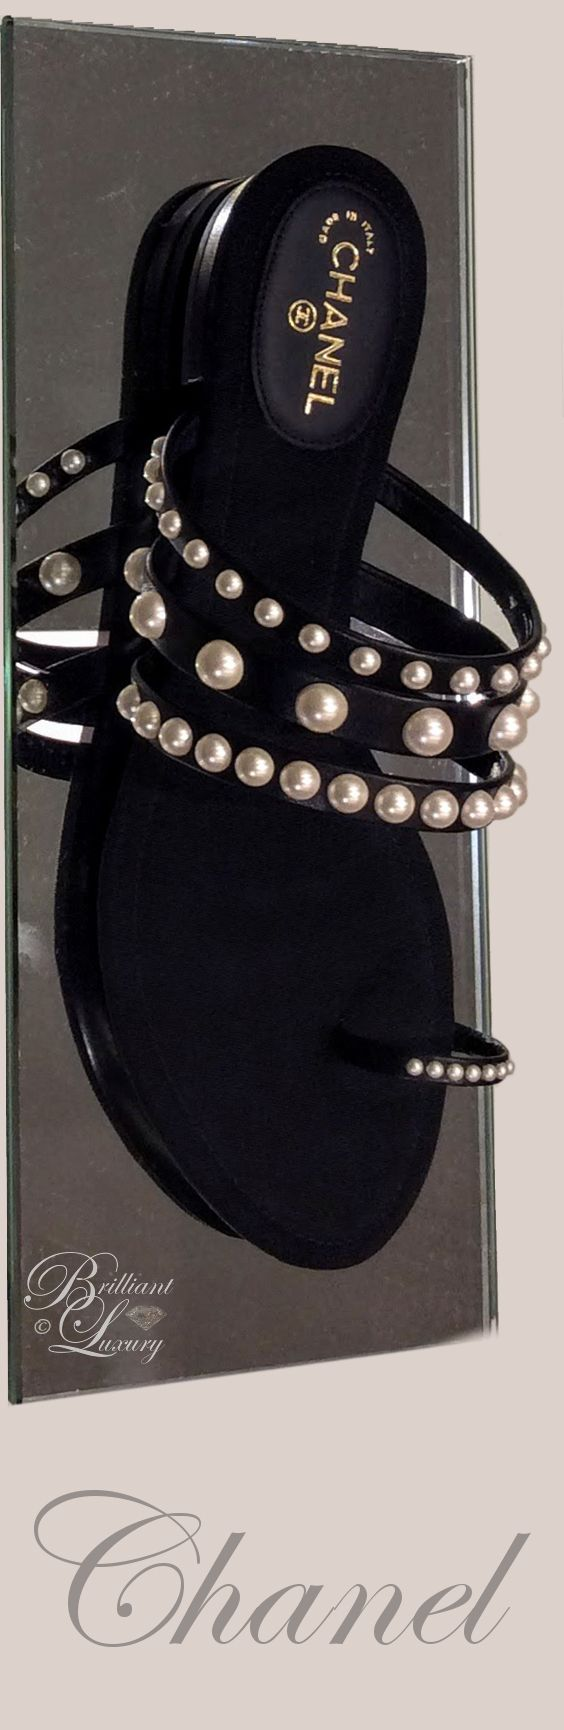 Brilliant Luxury by Emmy DE * Chanel #sandals